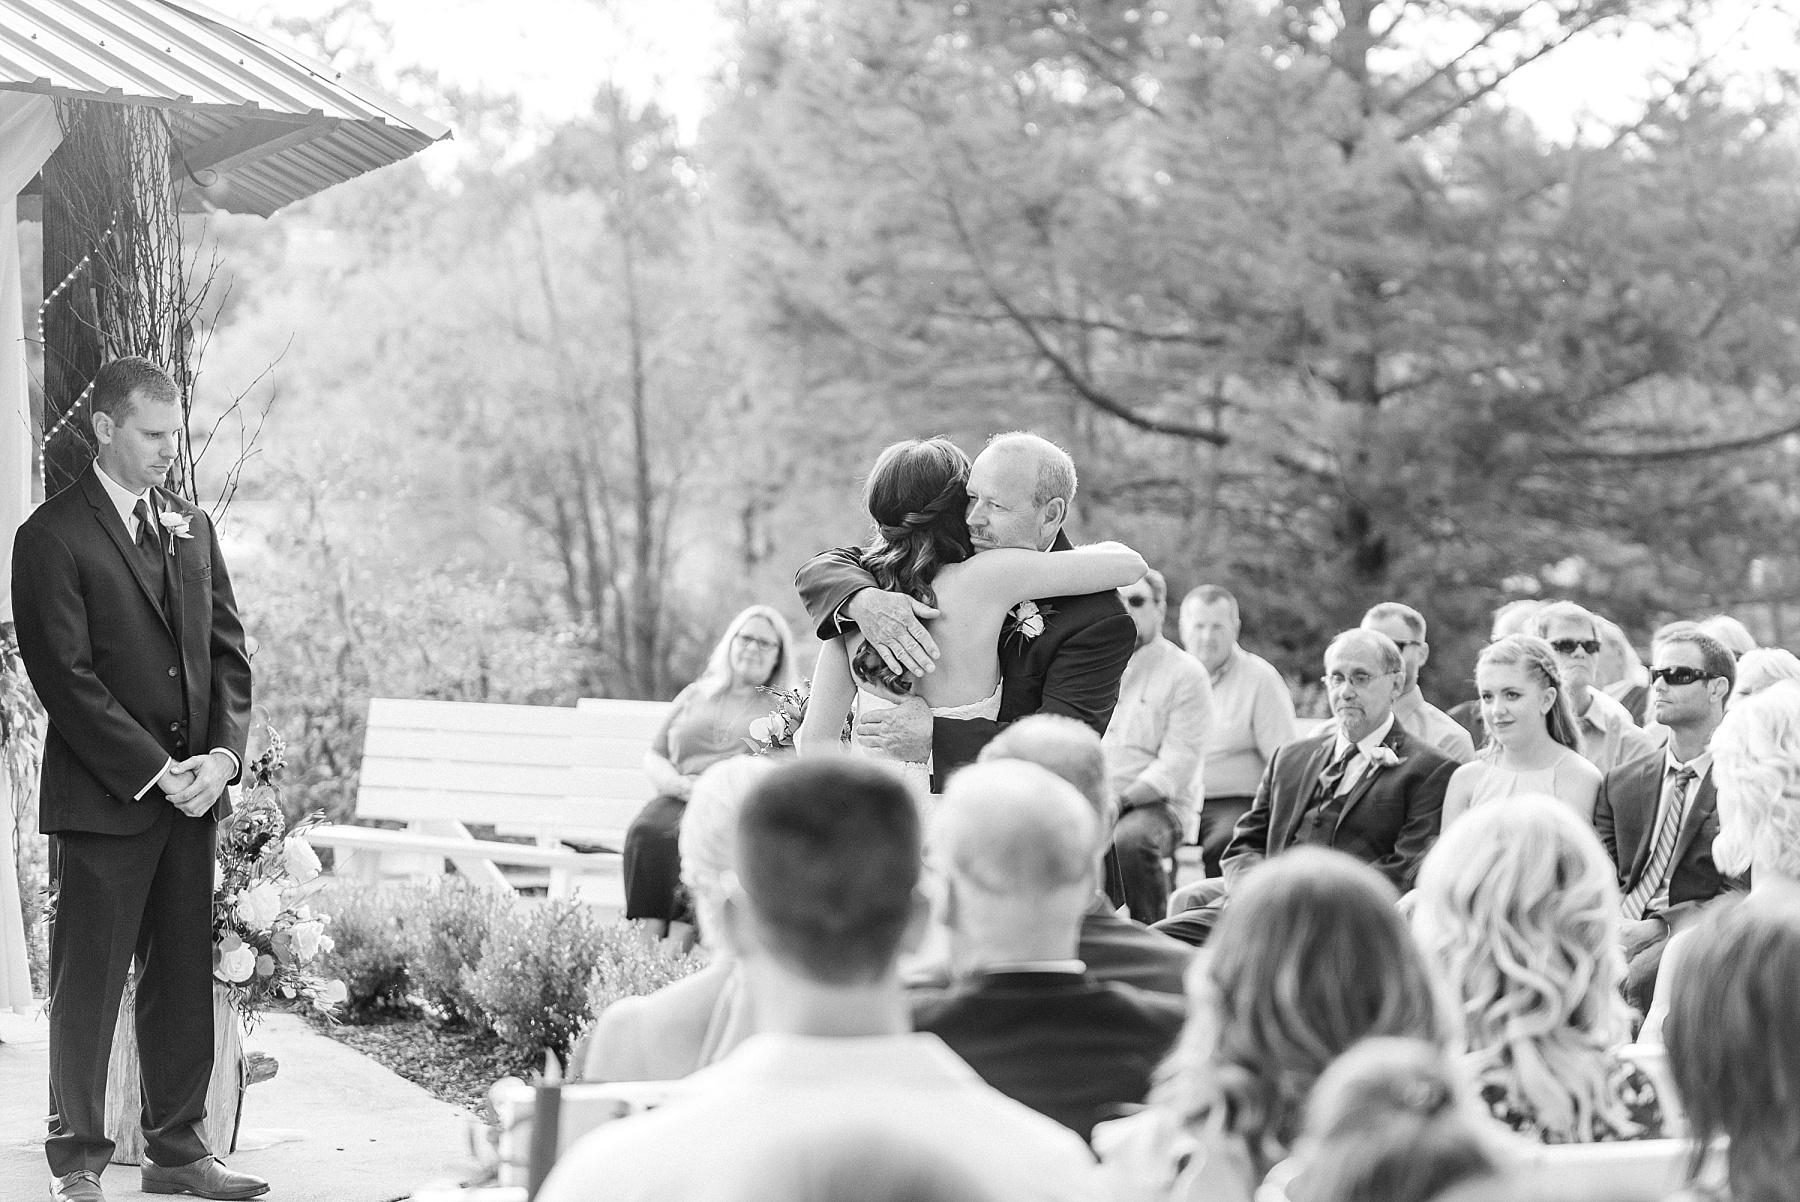 Romantic Summer Sunset Wedding Ceremony at Little Piney Lodge St. Louis Missouri by Kelsi Kliethermes Photography Fine Art Photographer_0008.jpg